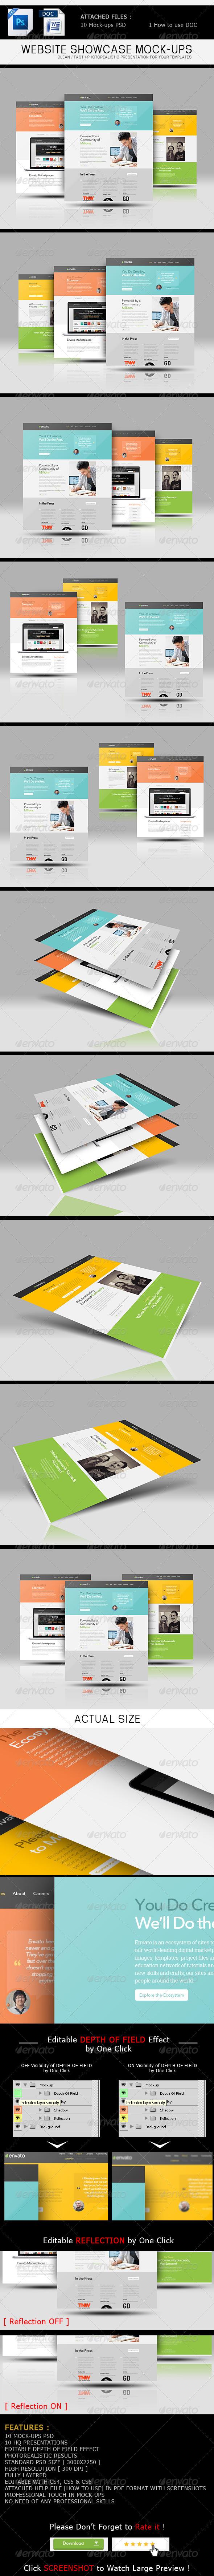 GraphicRiver Website Showcase Mockups V 1.0 6821347